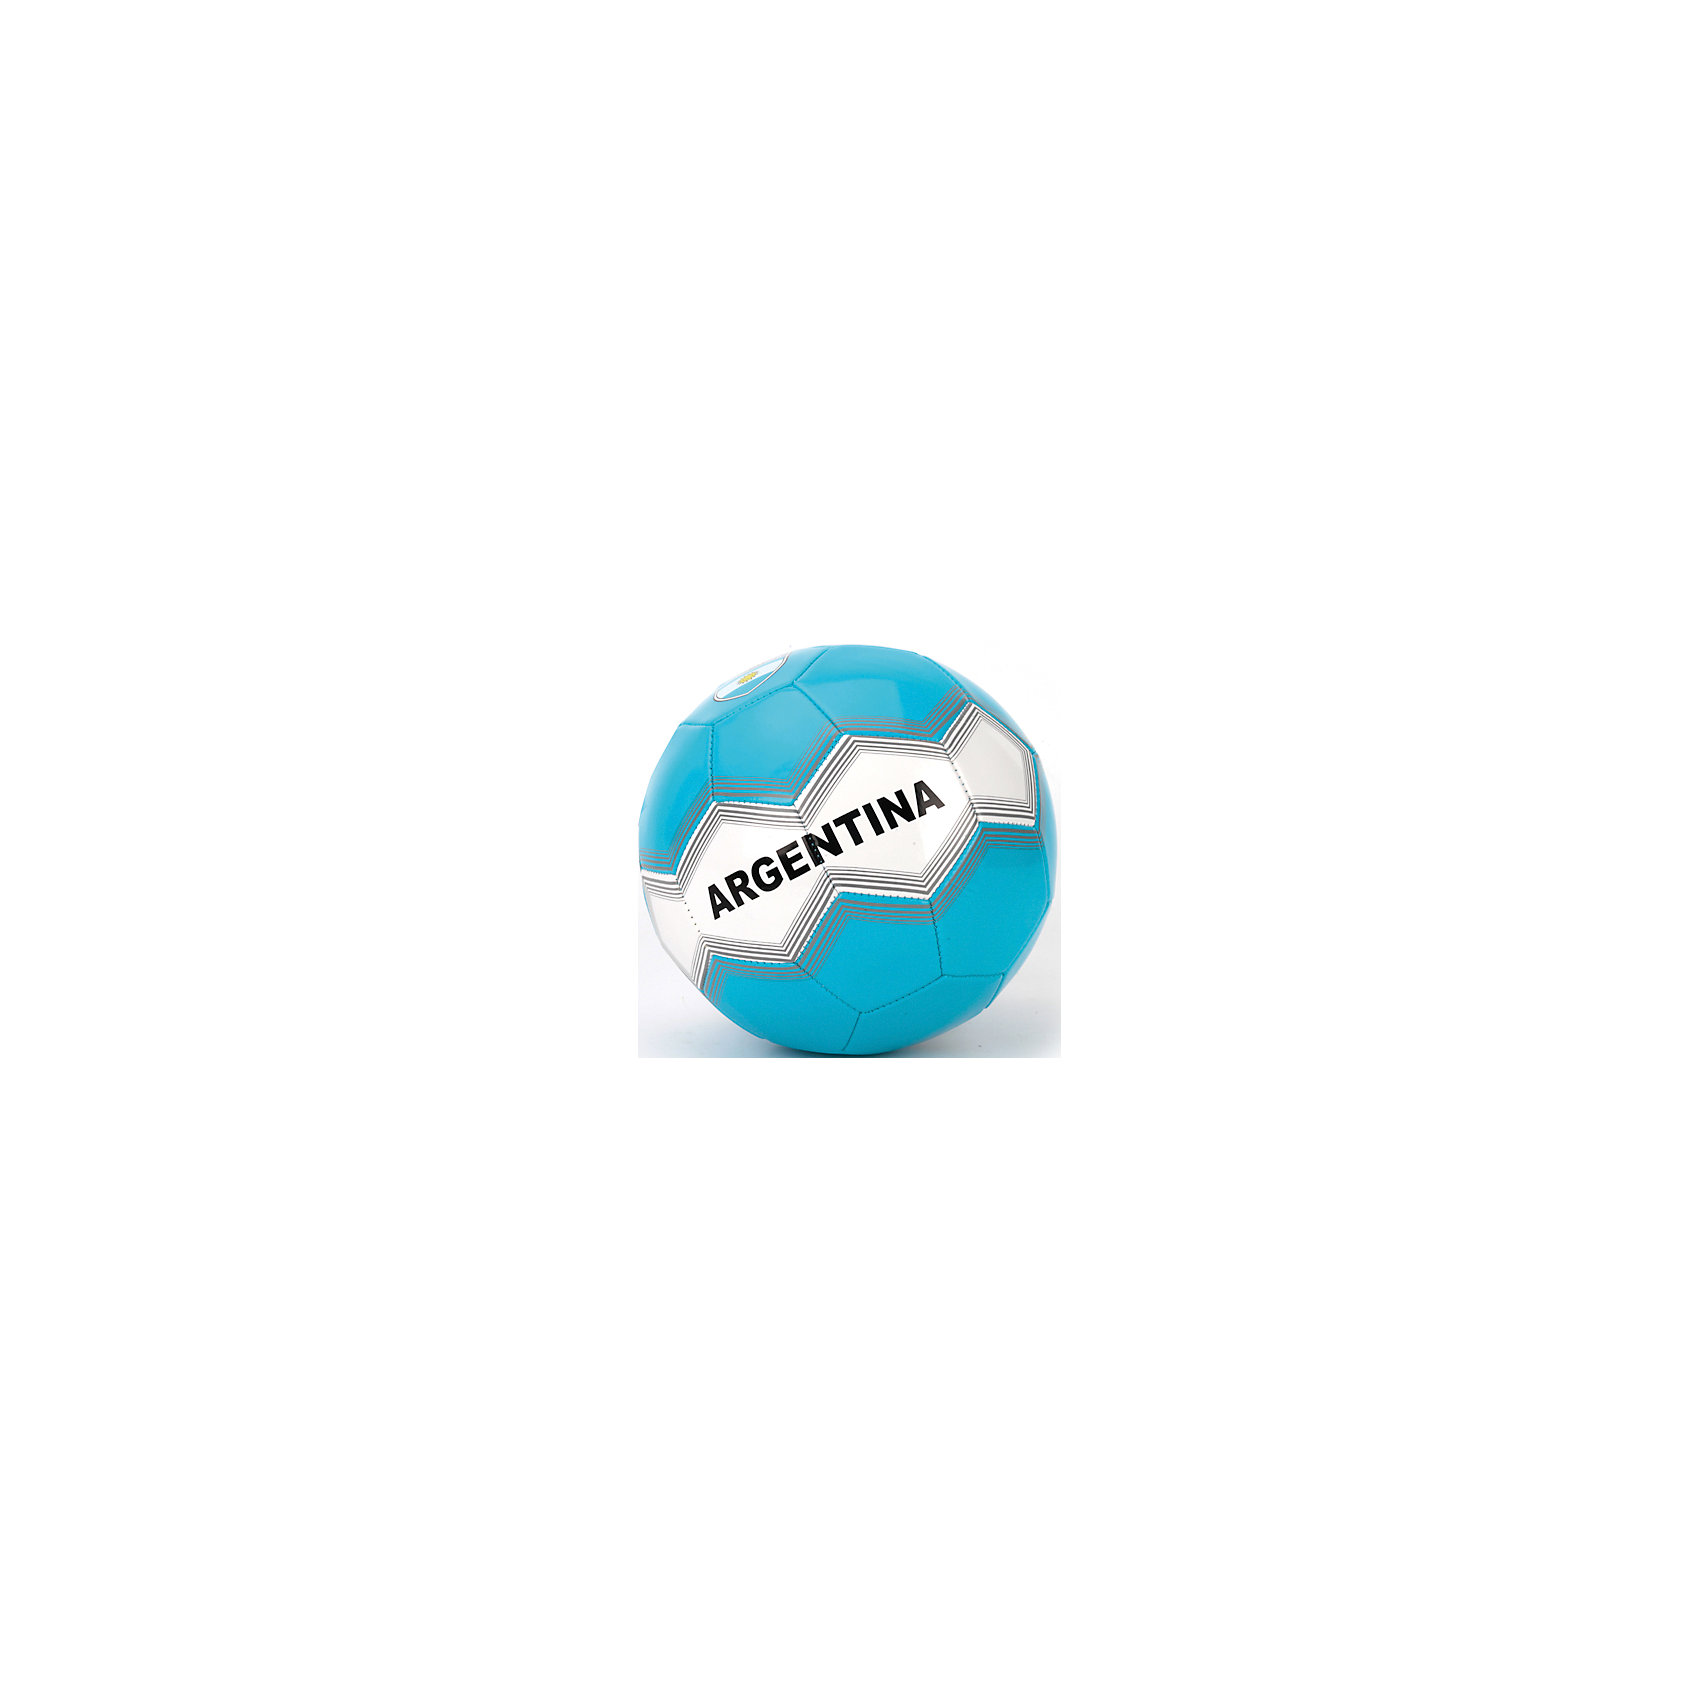 Футбольный мячСборная Аргентины, АтлетикМячи детские<br>Мяч футбольный лакированный, ПВХ, 1 слой, 270 грамм, дизайн Сборная Аргентины.<br><br>Ширина мм: 230<br>Глубина мм: 230<br>Высота мм: 230<br>Вес г: 280<br>Возраст от месяцев: 36<br>Возраст до месяцев: 96<br>Пол: Мужской<br>Возраст: Детский<br>SKU: 5528139